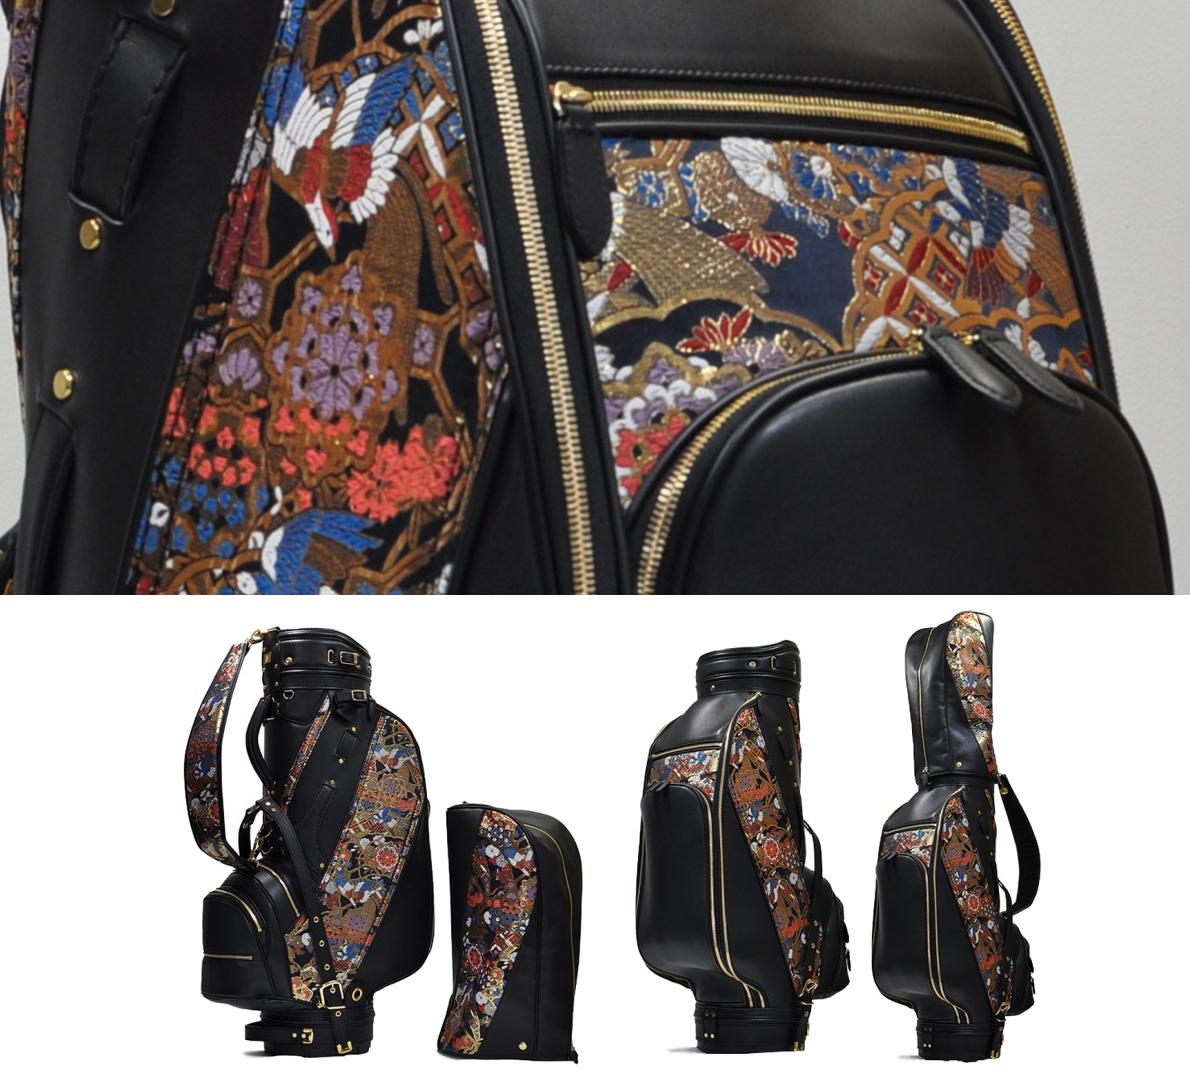 Michibiki Phoenix Nishijin-Ori Sheep Leather Caddy Bag